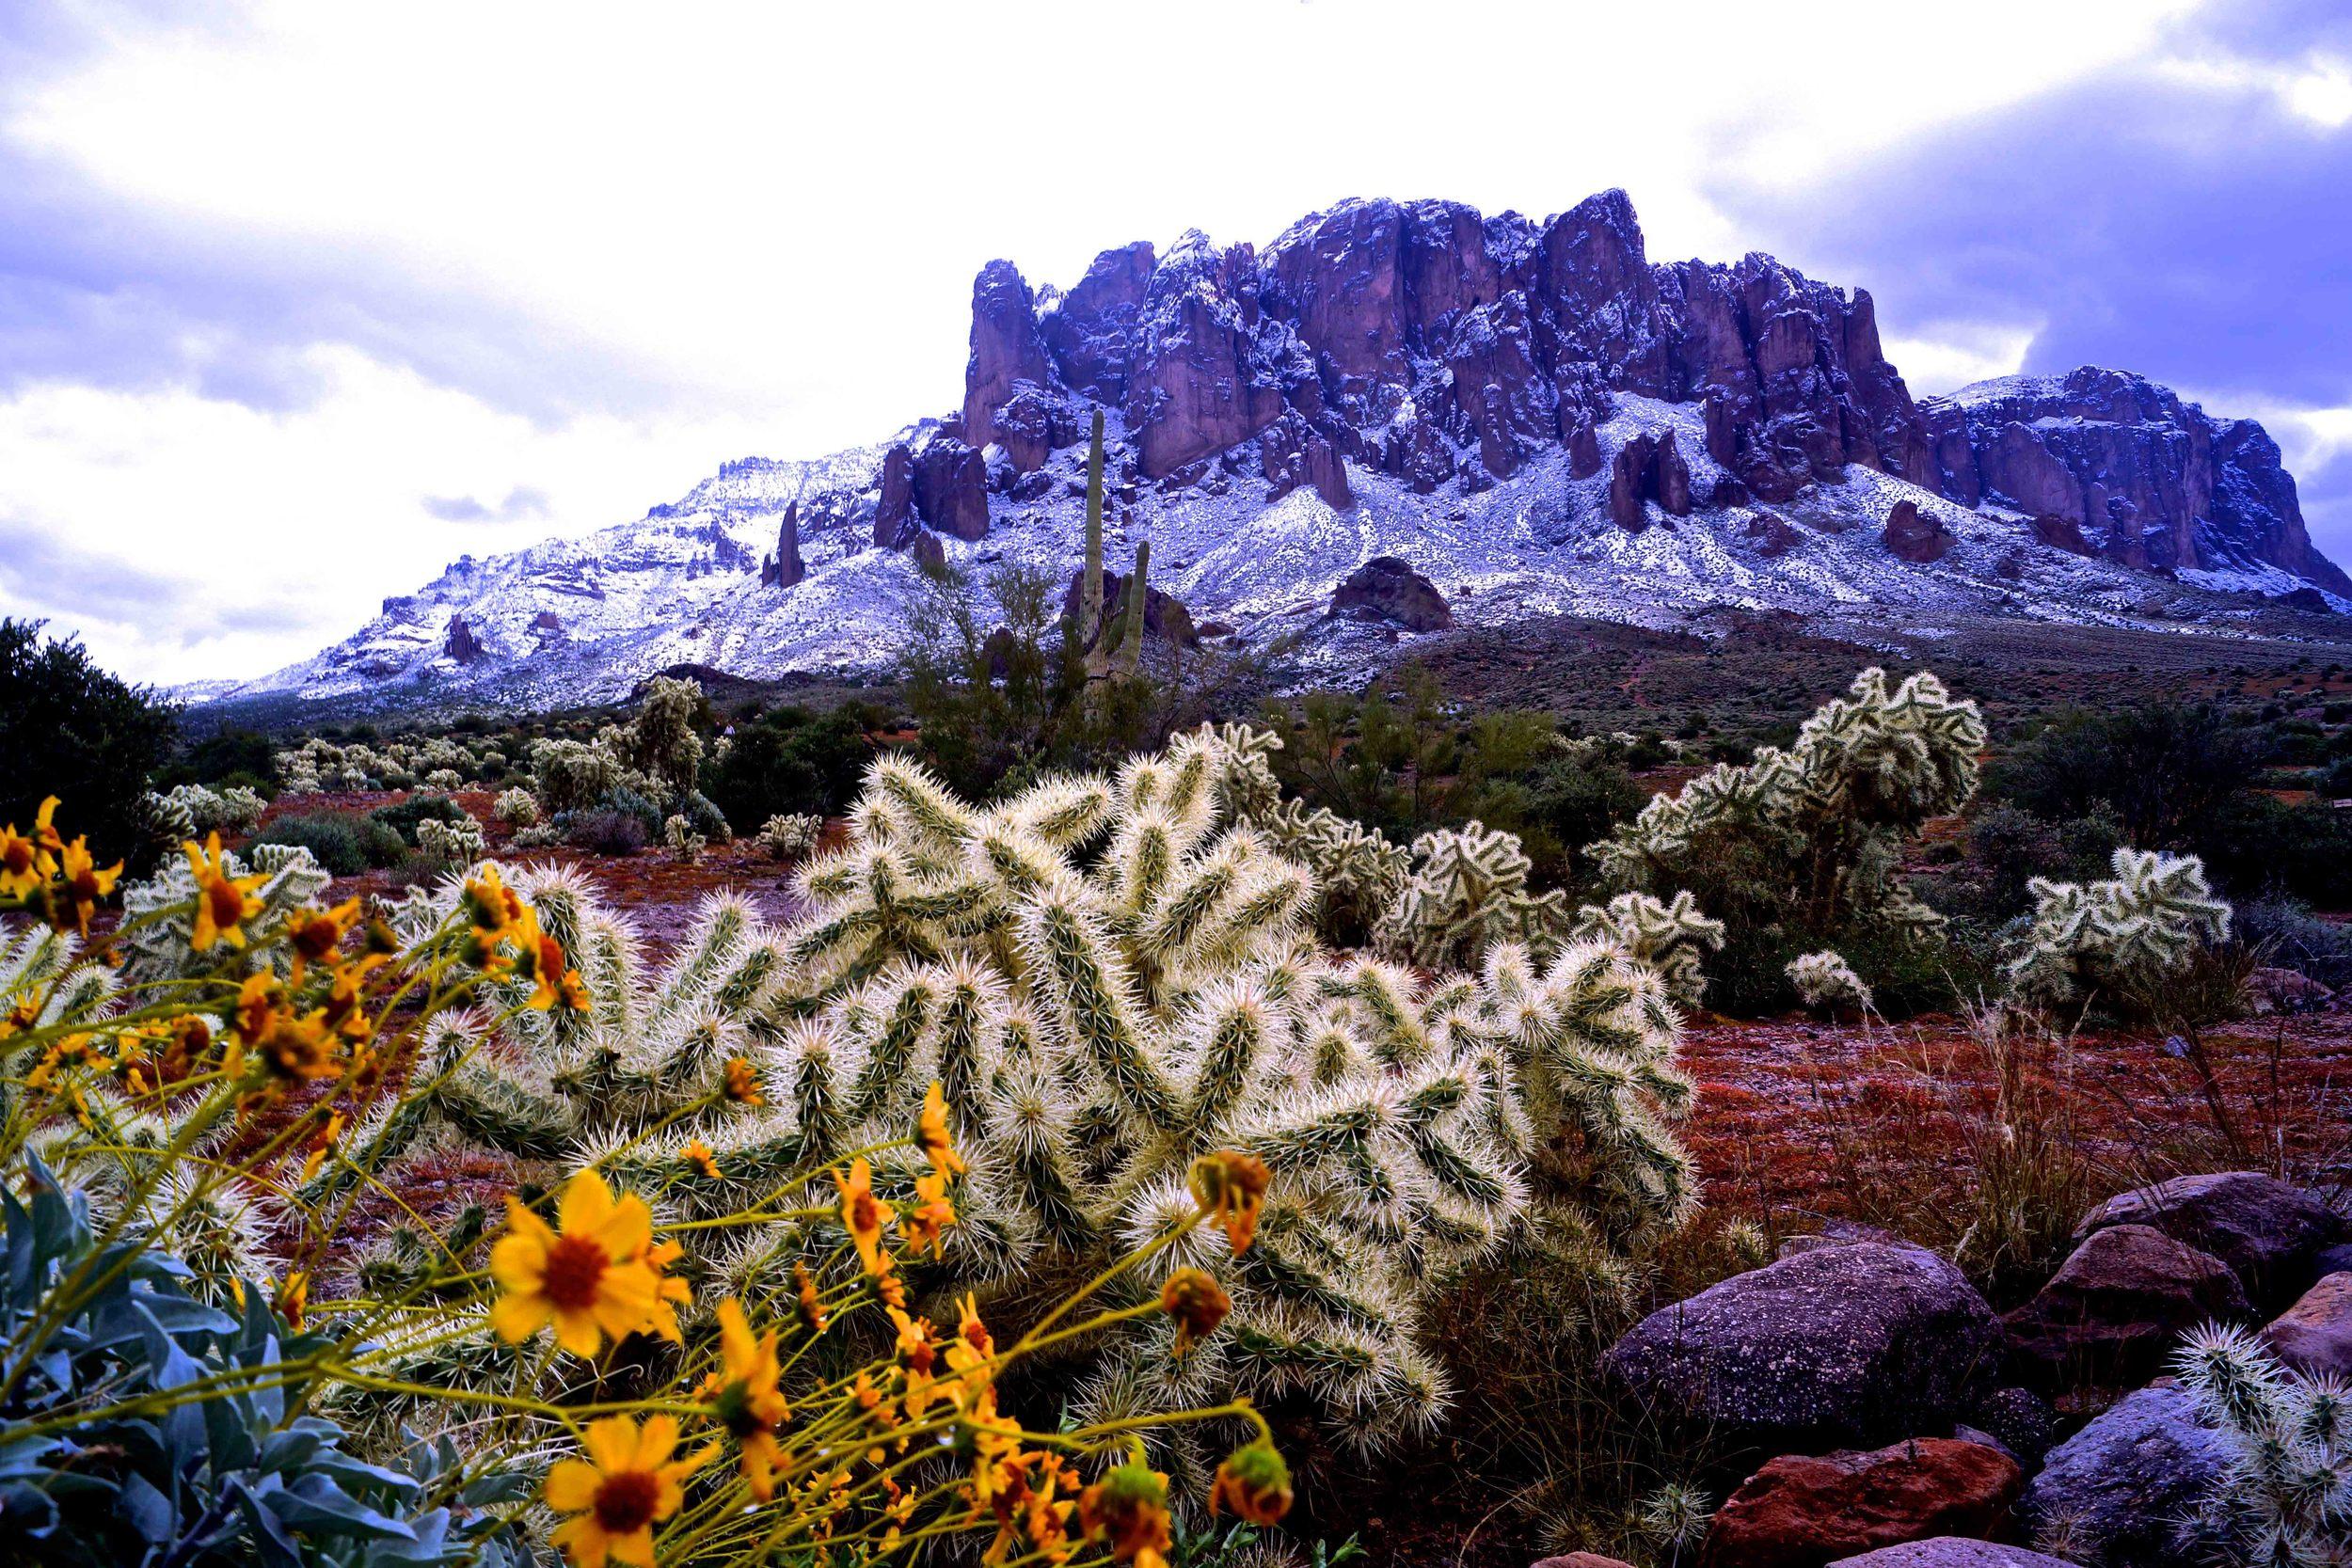 Superstition Mountains, Arizona, January 2015